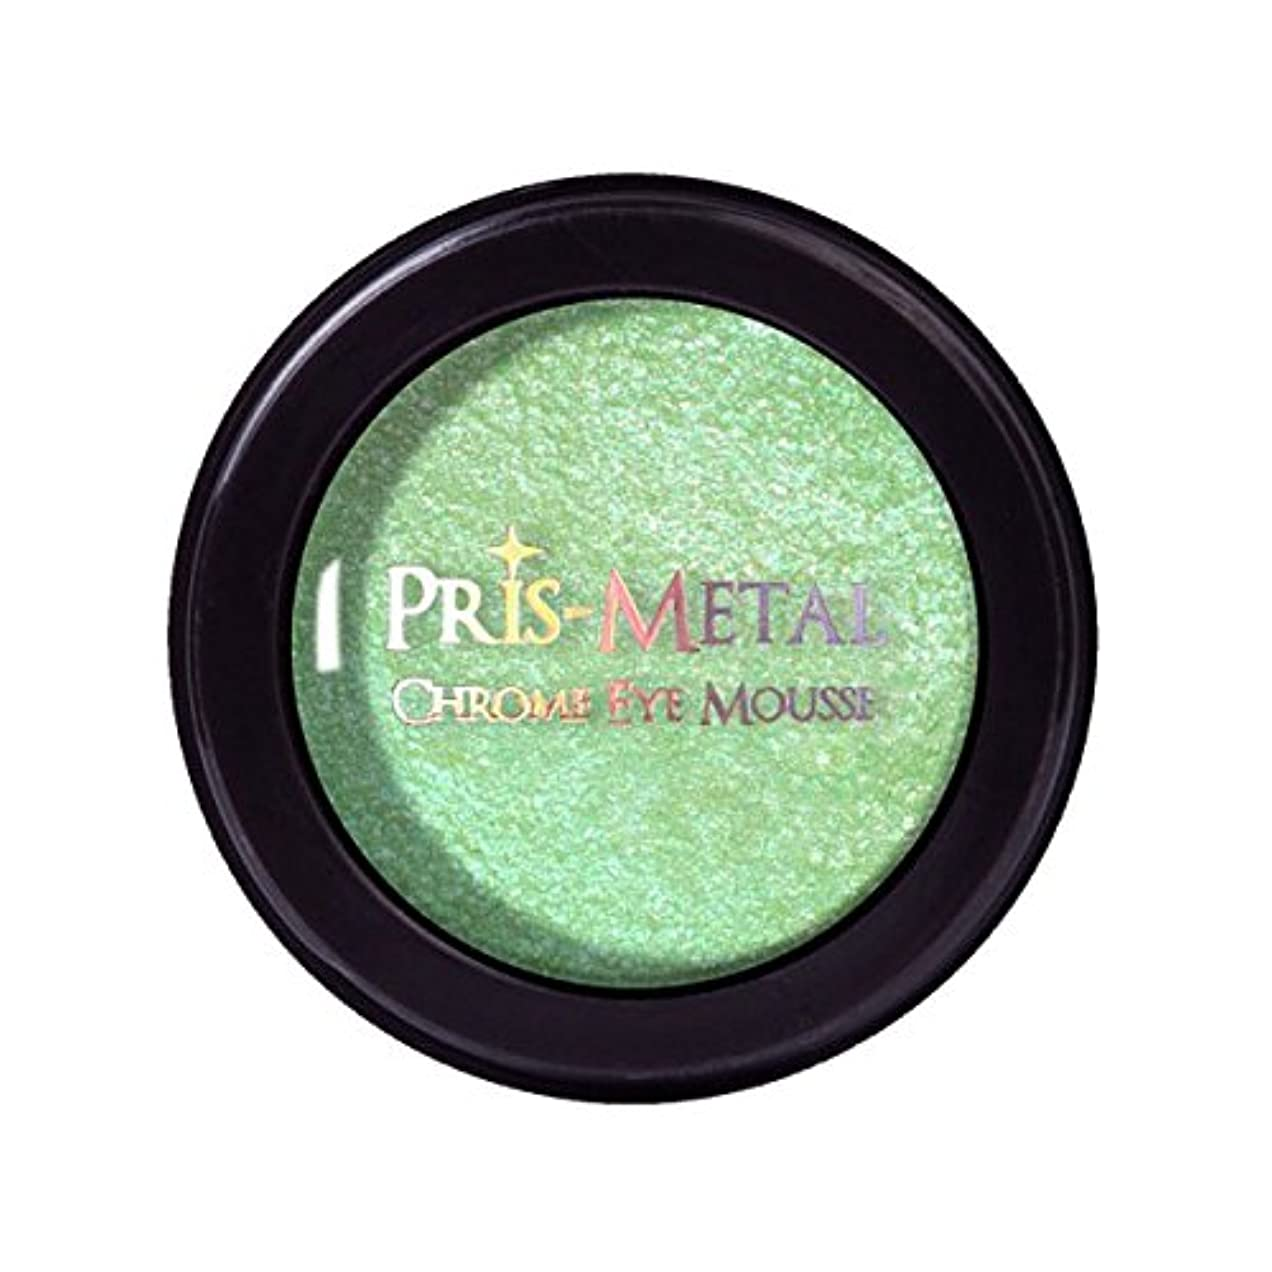 J. CAT BEAUTY Pris-Metal Chrome Eye Mousse - Pixie Dust (並行輸入品)